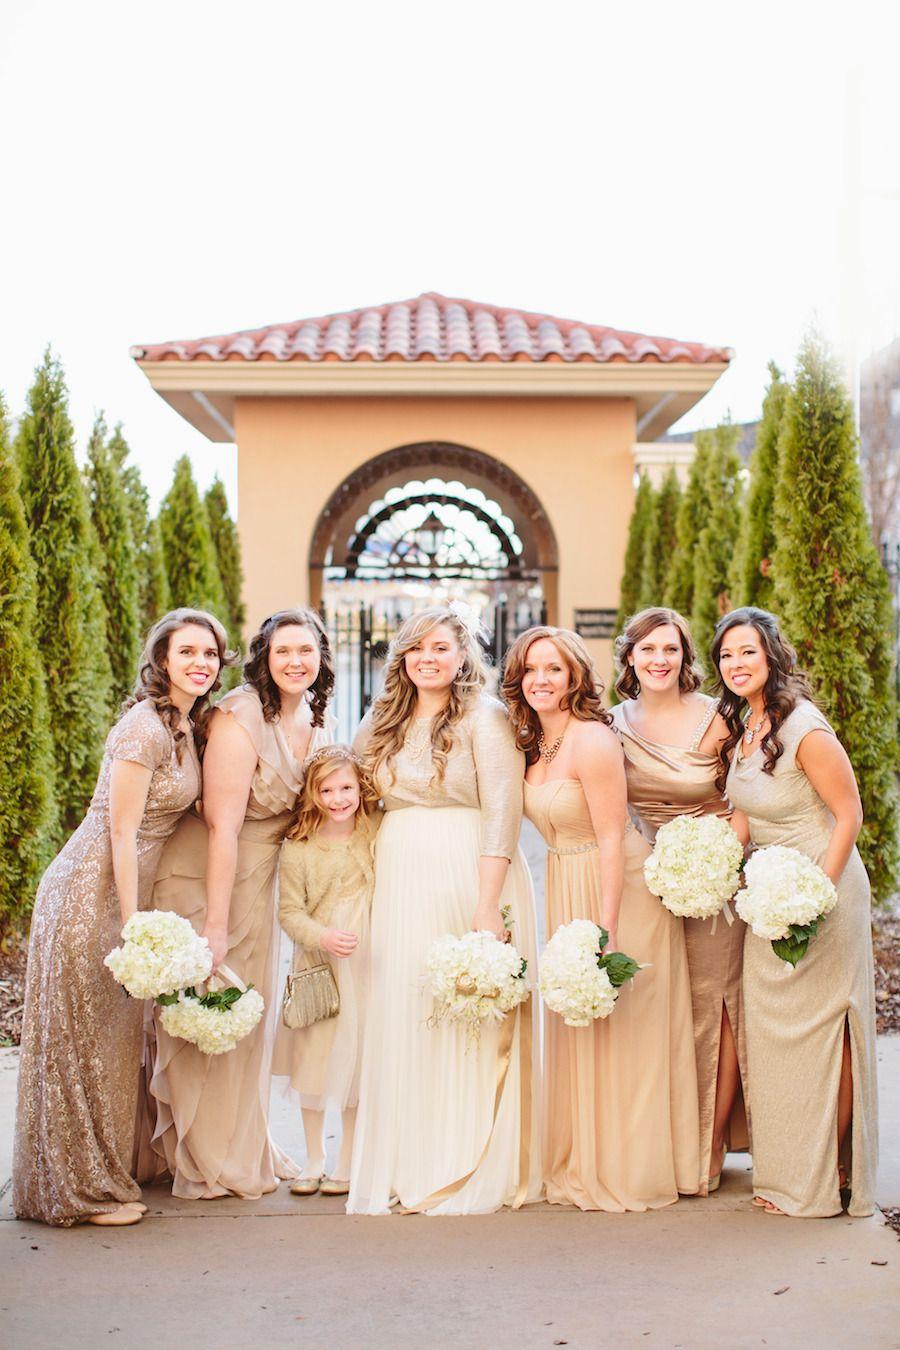 Silver + Gold New Year's Eve Wedding Wedding, Bridesmaid